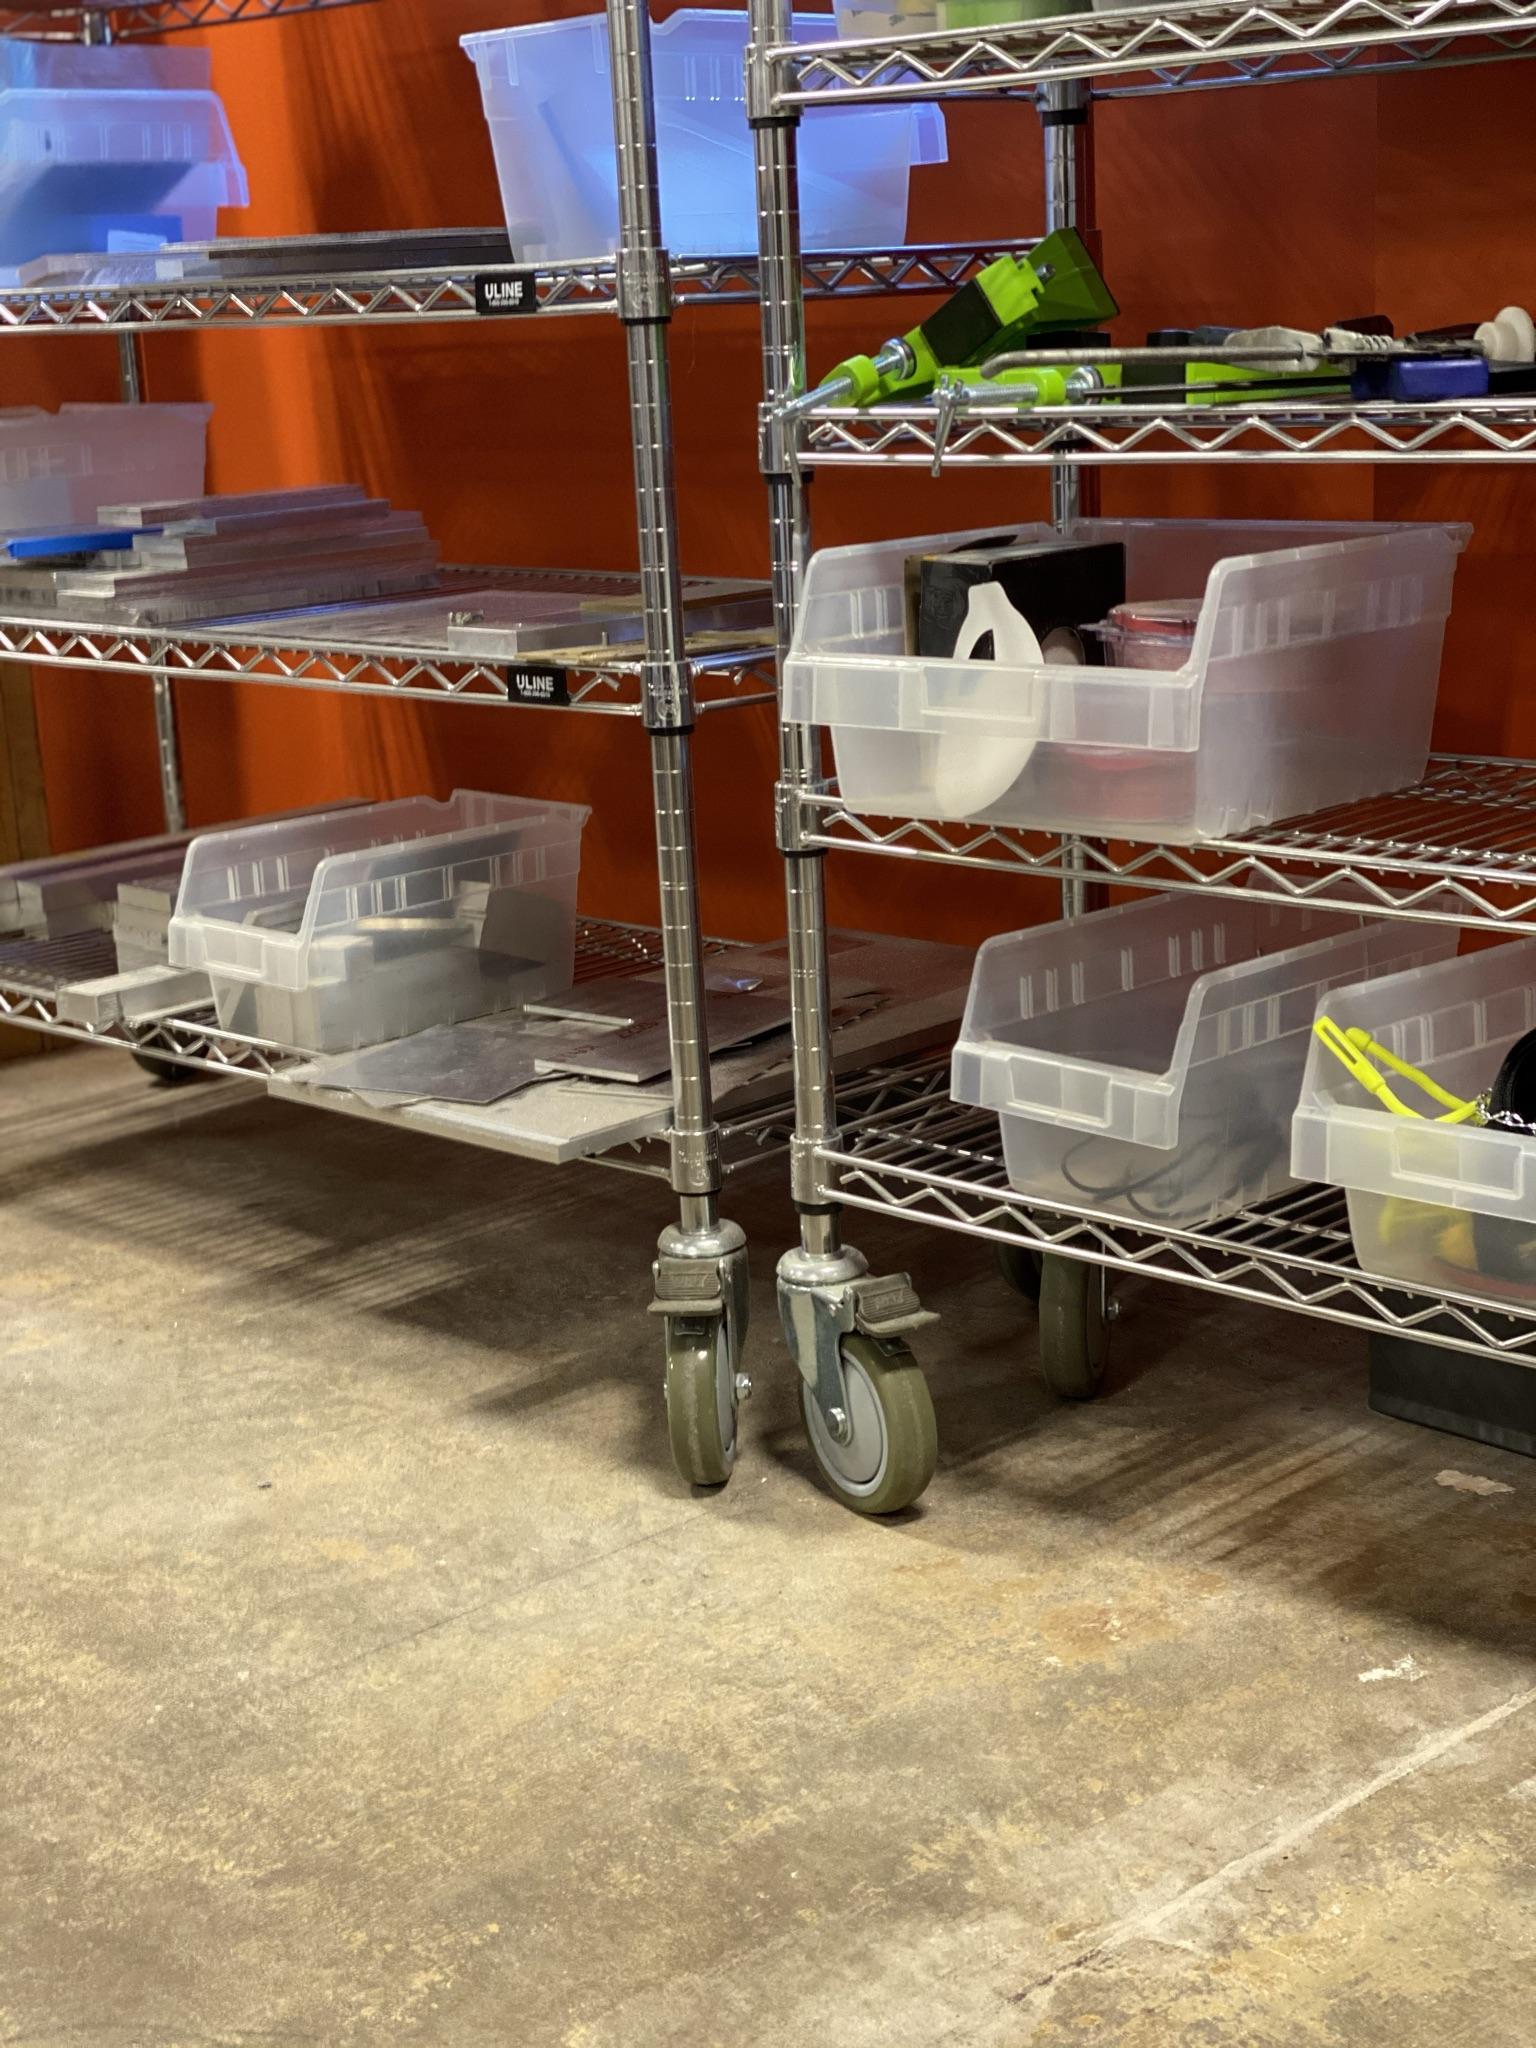 Agile Workspace - Tool Storage On Wheels